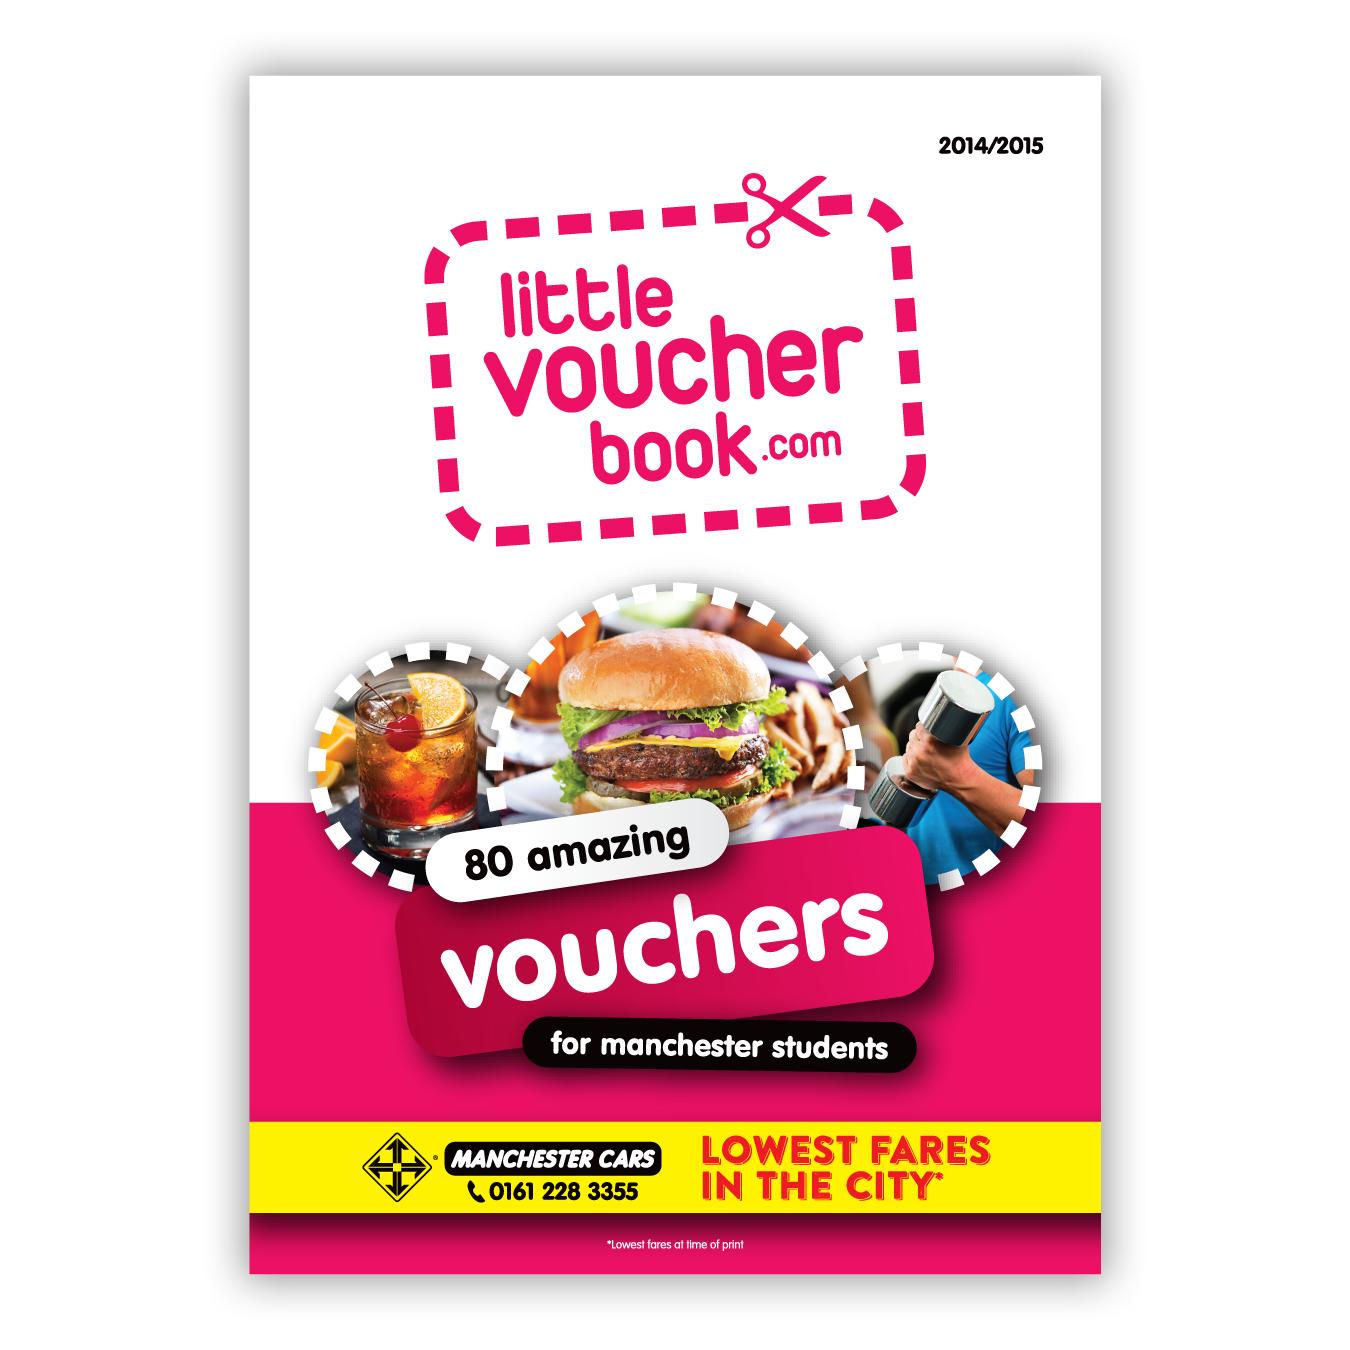 Home / Little Voucher Book – Manchester Student Edition 2014/2015